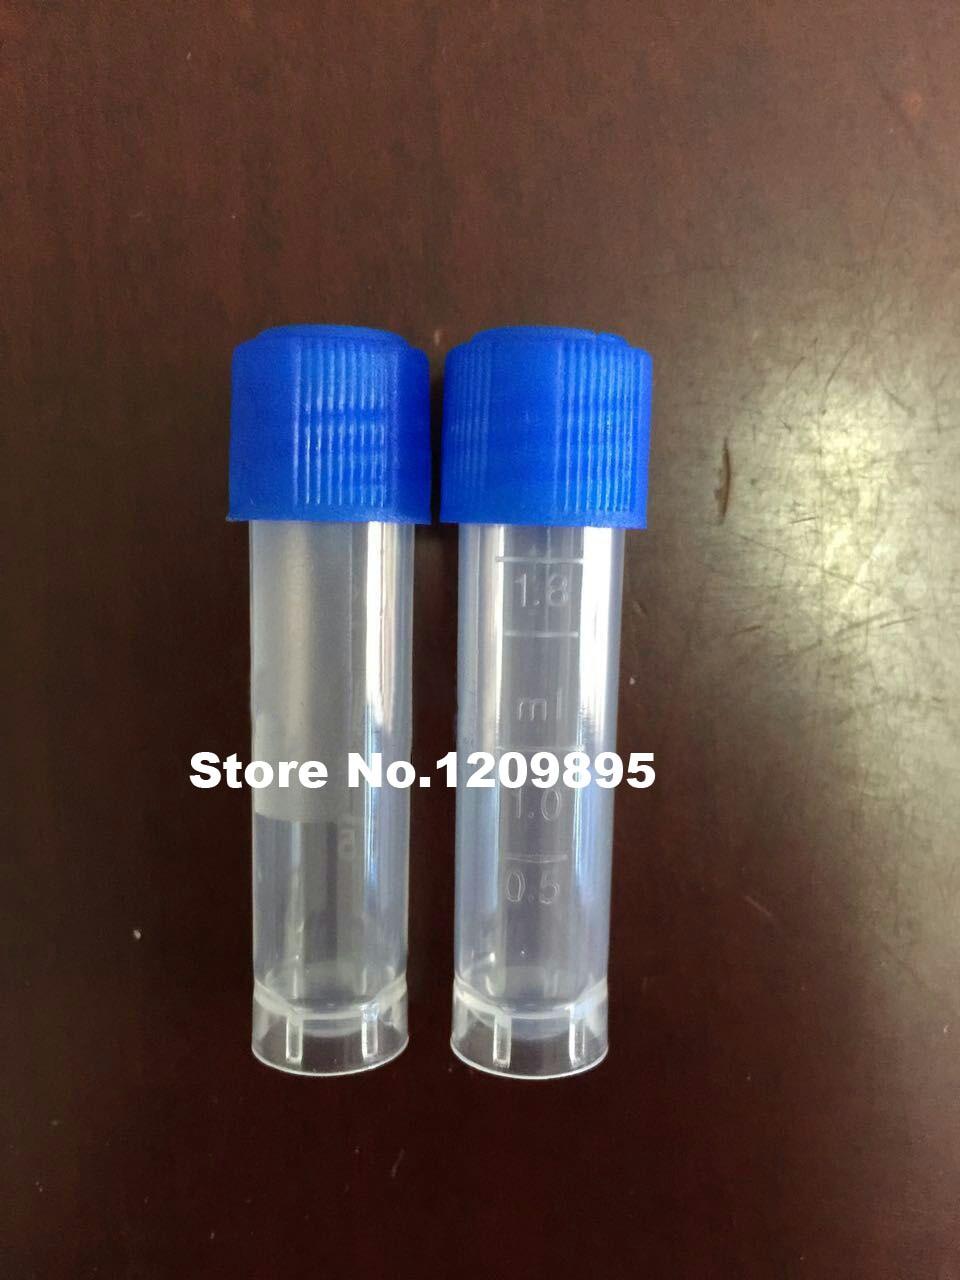 500pcs/lot New pattern 1.8ml 2ml Cryopreservation test tube Cryogenic Vials Laboratory cryovial plastic with Silica gel washer 500pcs/lot New pattern 1.8ml 2ml Cryopreservation test tube Cryogenic Vials Laboratory cryovial plastic with Silica gel washer